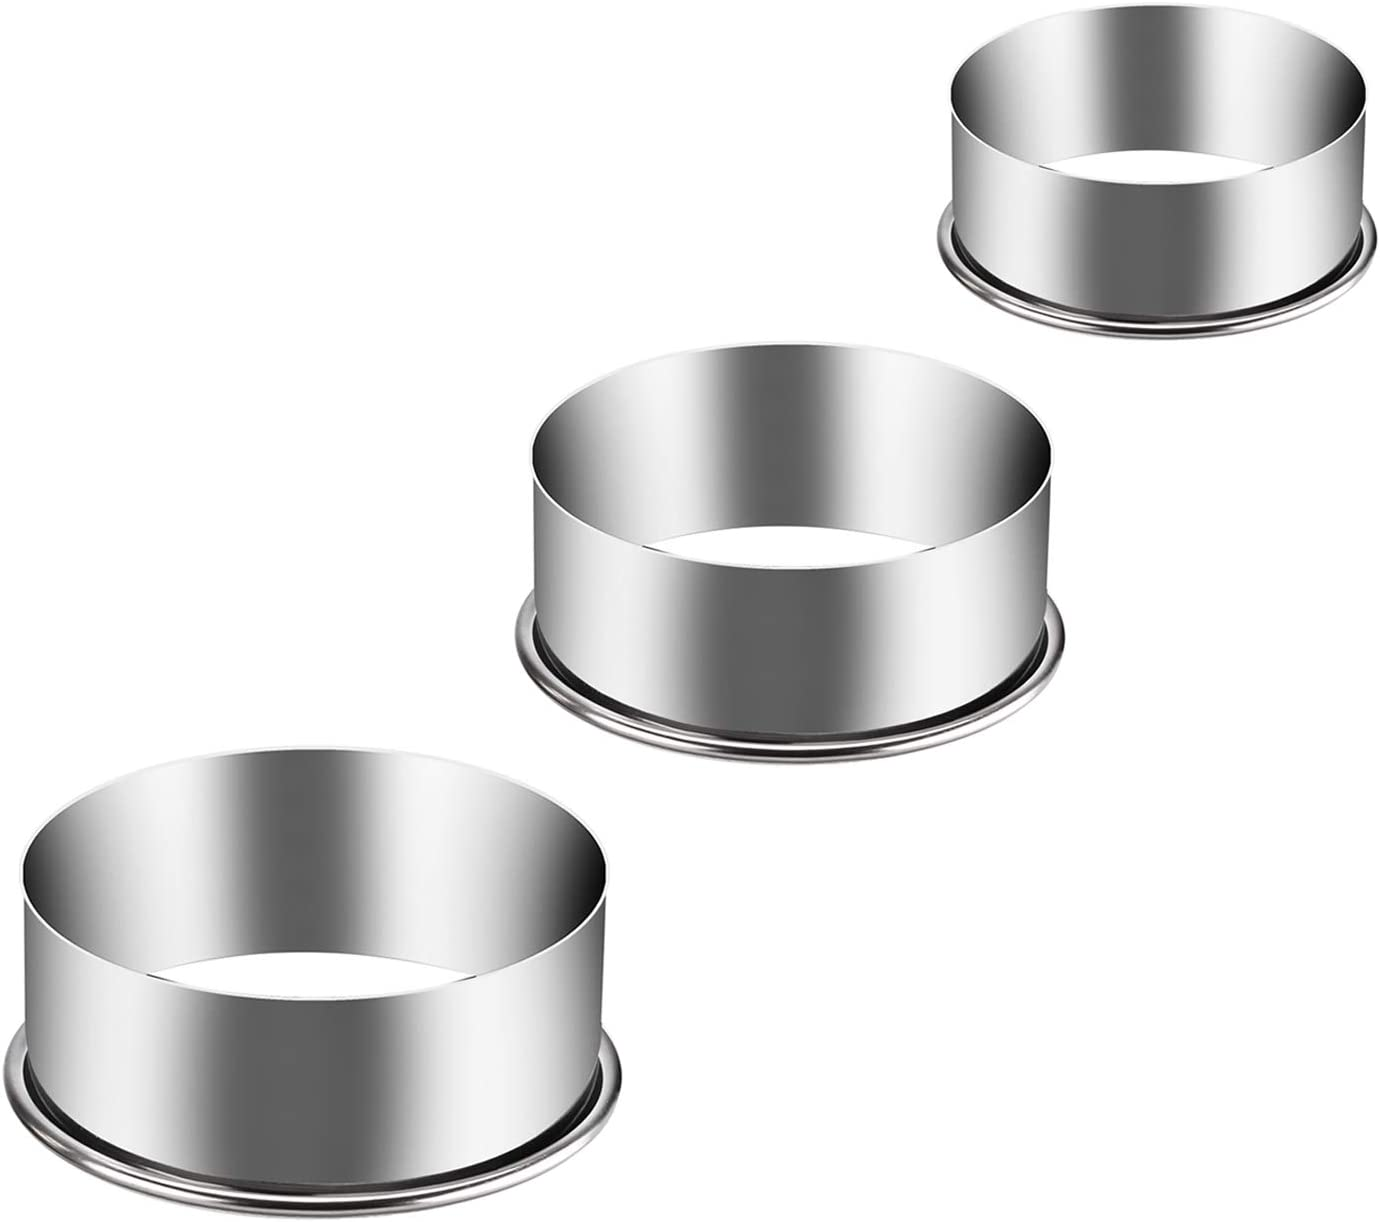 Blue 3-Piece Smooth Stainless Steel Metal Behind Play Item